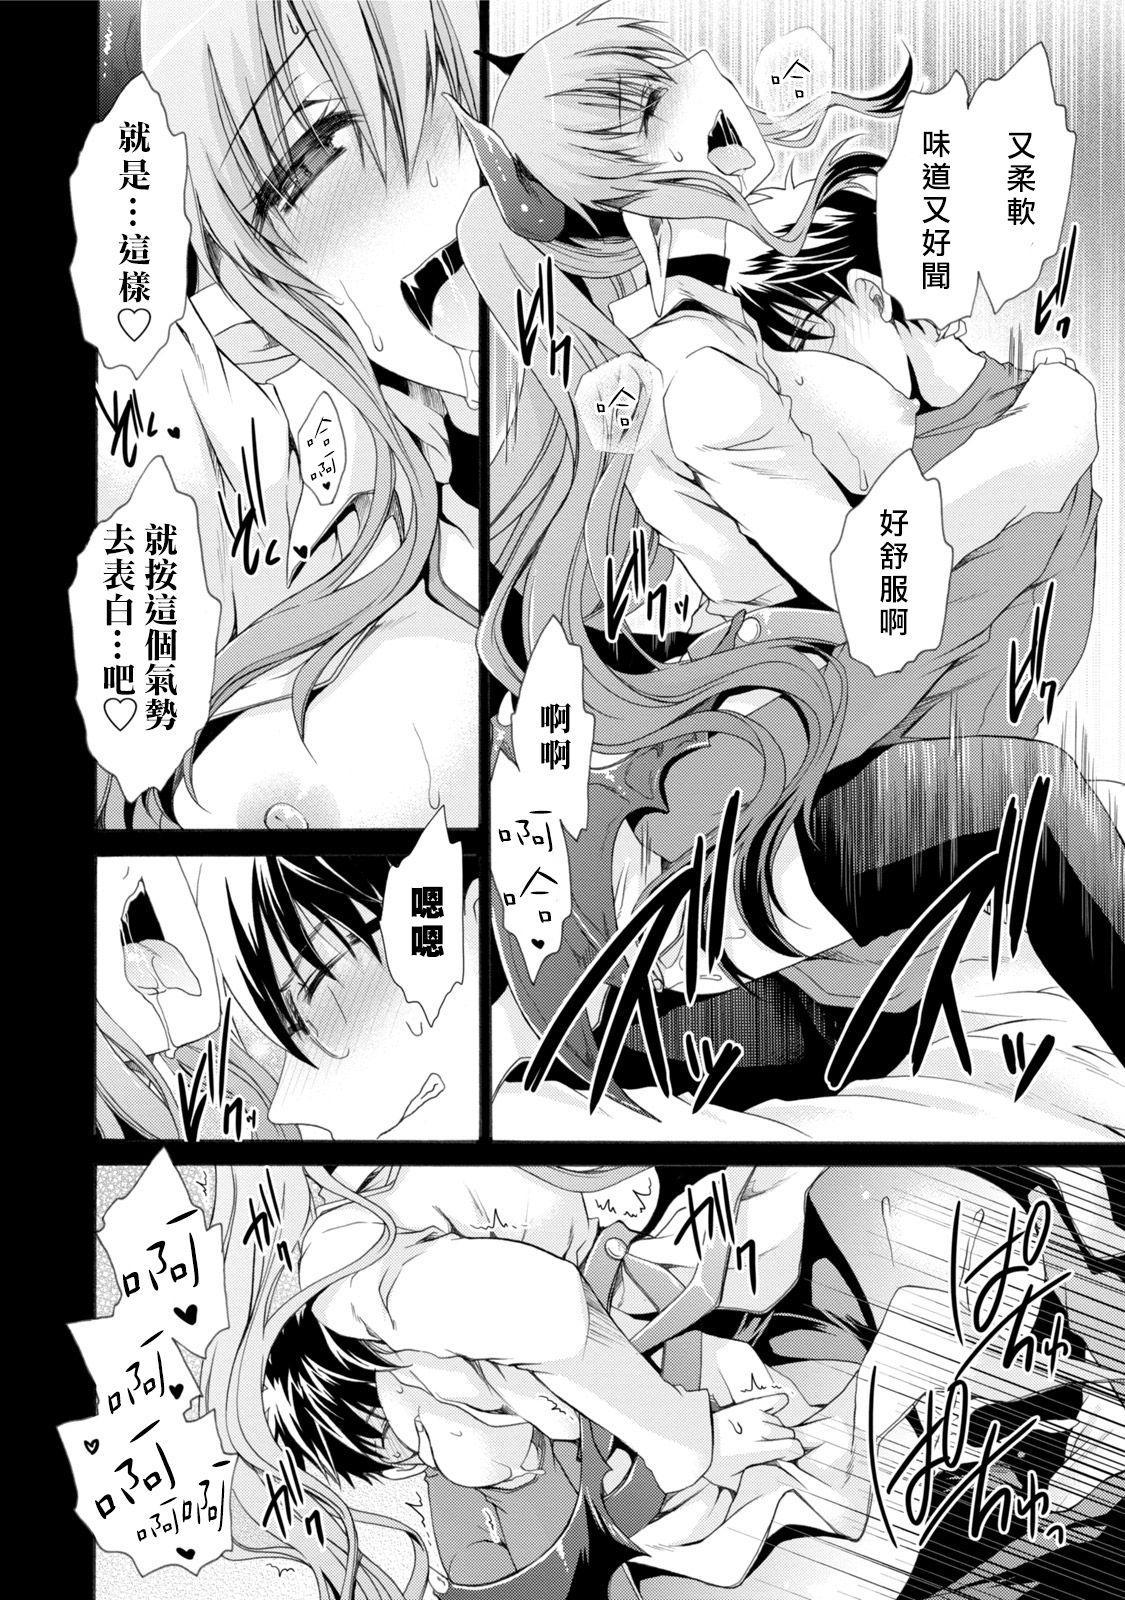 [Shinonome Ryu] Ore to Kanojo to Owaru Sekai - World's end LoveStory 1-5 [Chinese] [爱弹幕汉化组] [Digital] 21